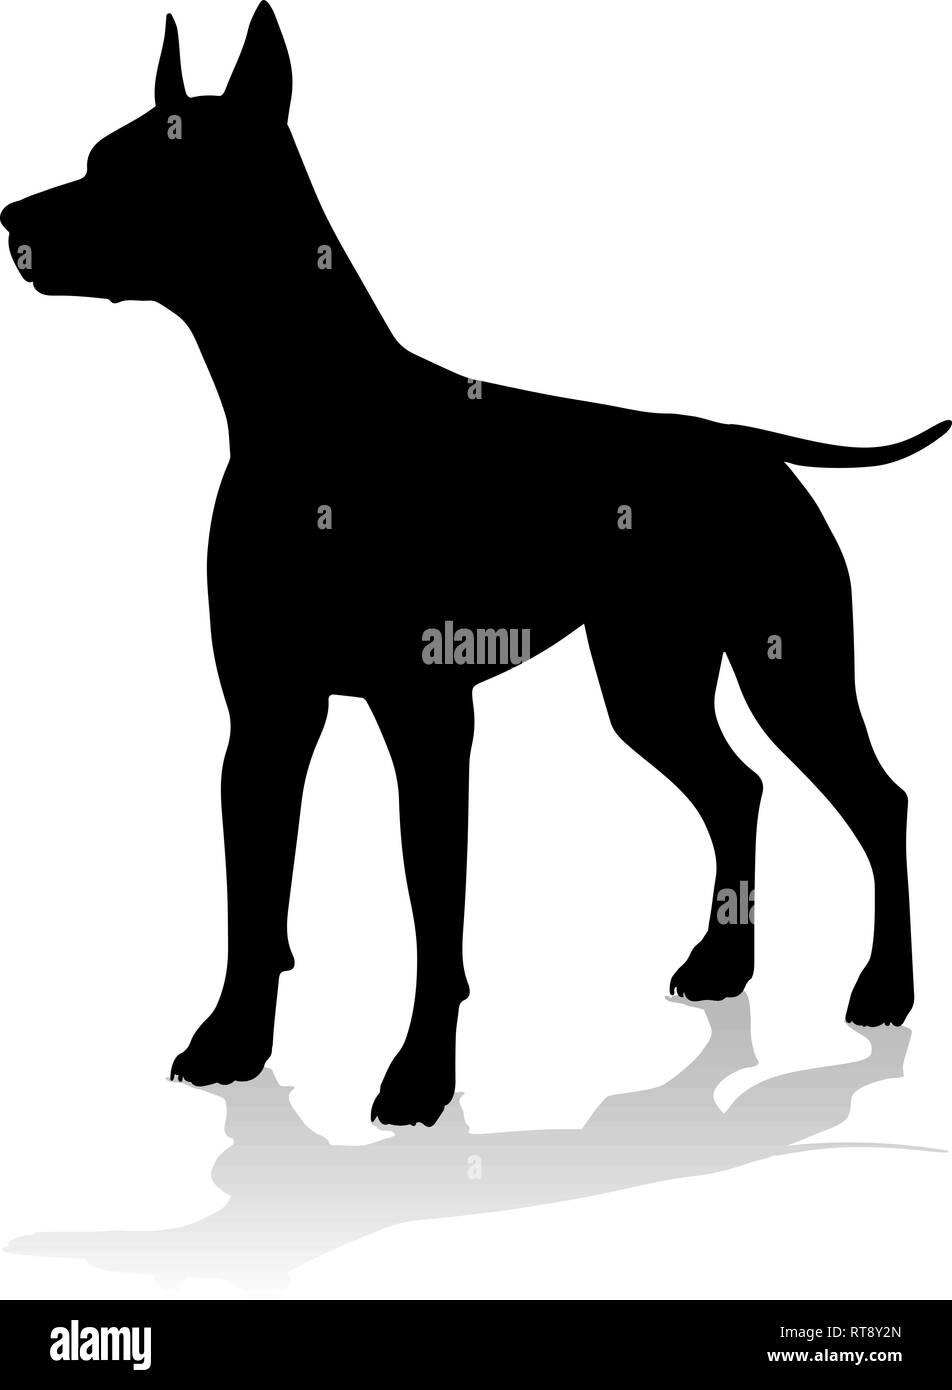 Dog Silhouette Pet Animal - Stock Vector